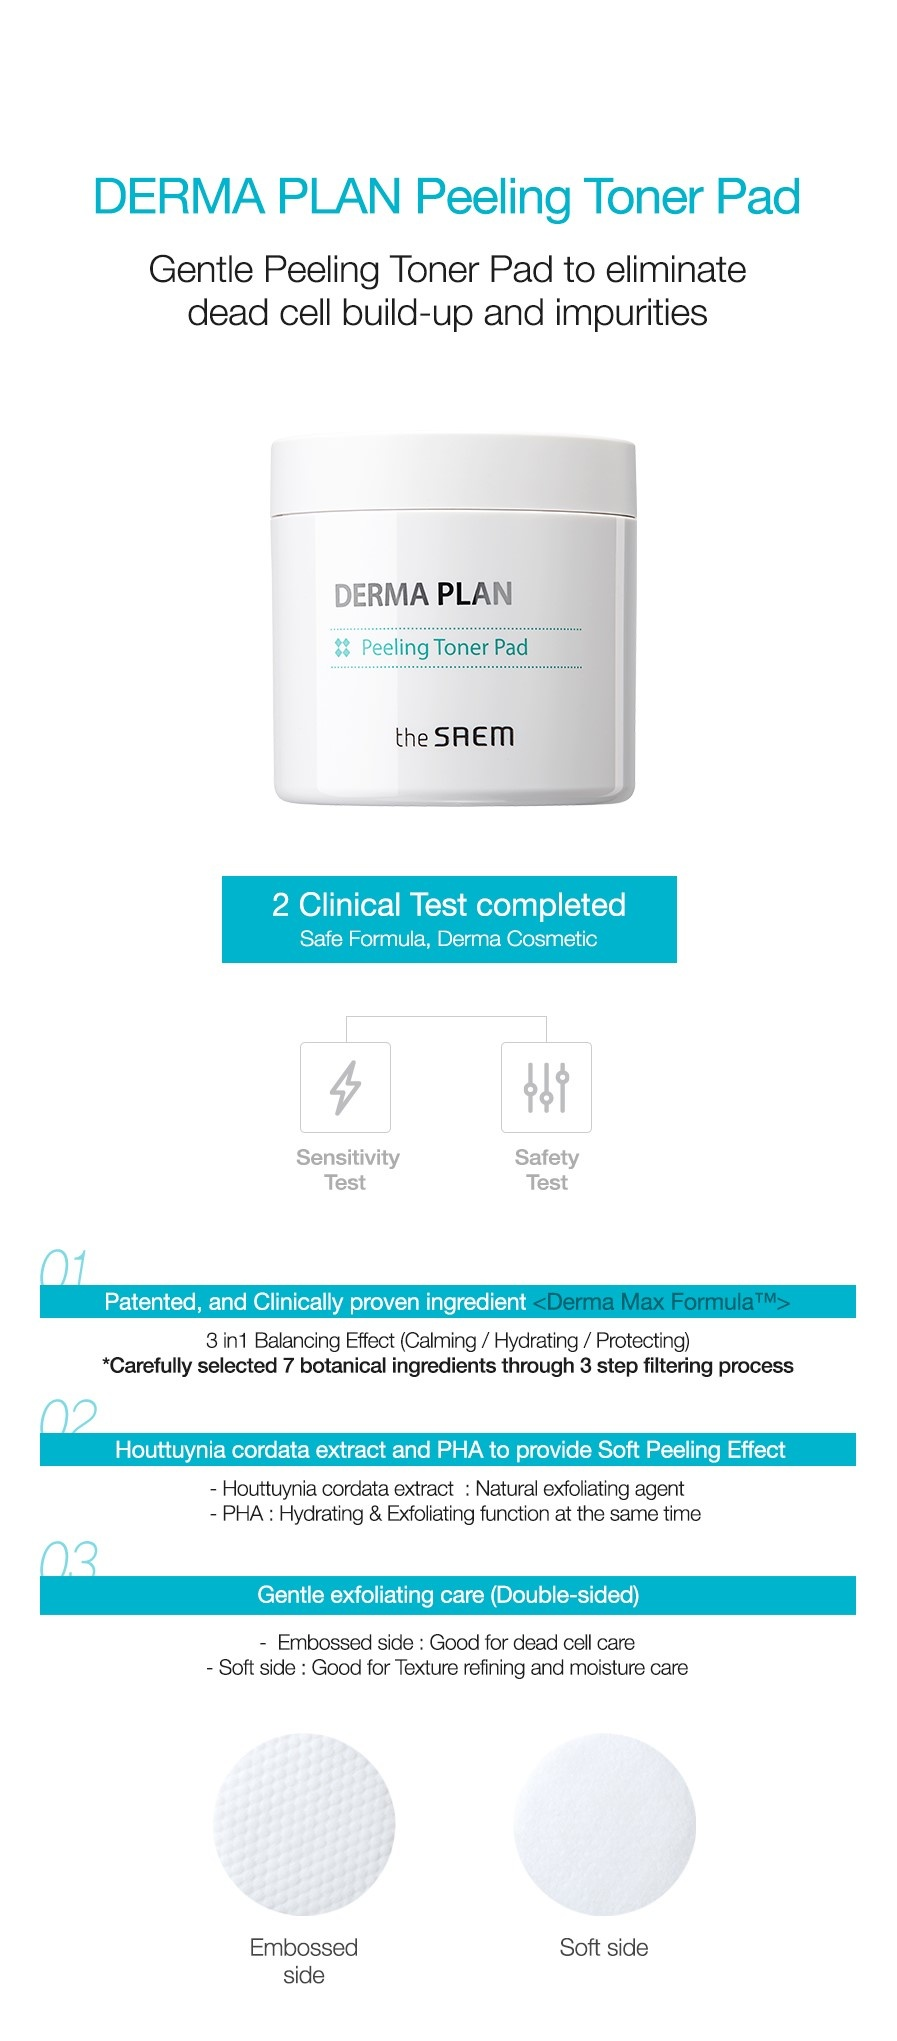 Derma Plan Peeling Toner Pad-2